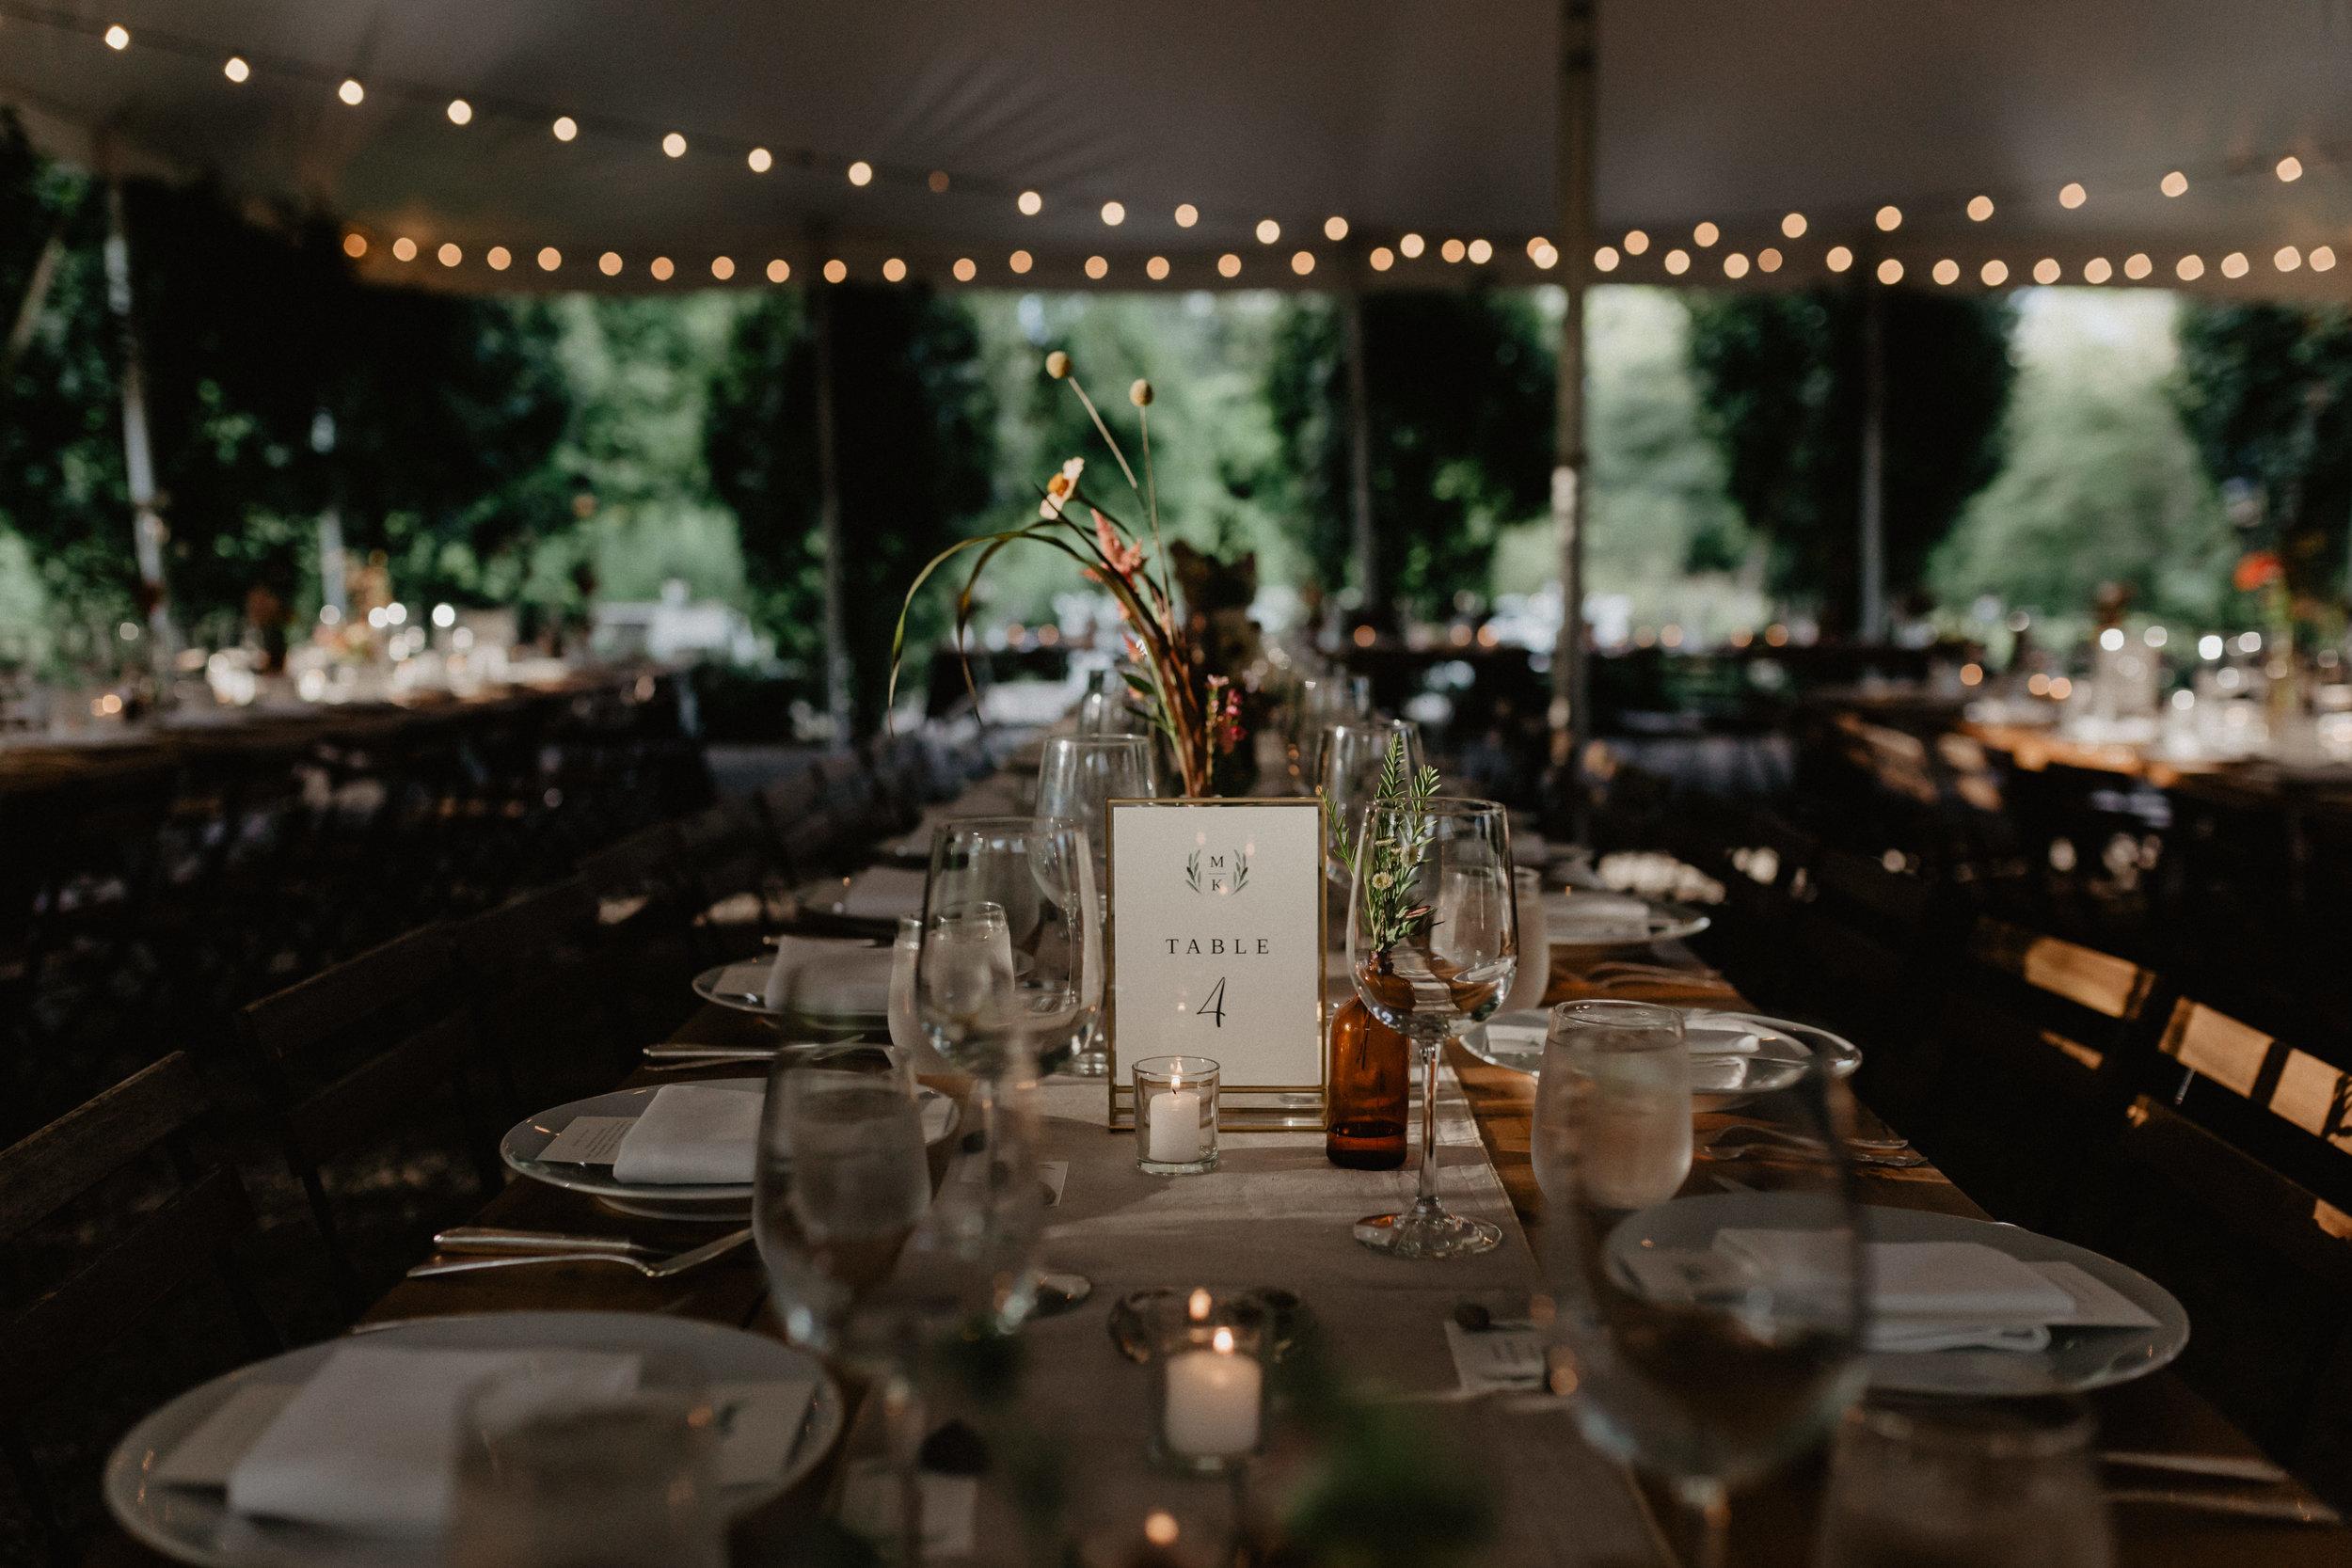 m-and-d-farm-wedding-90.jpg